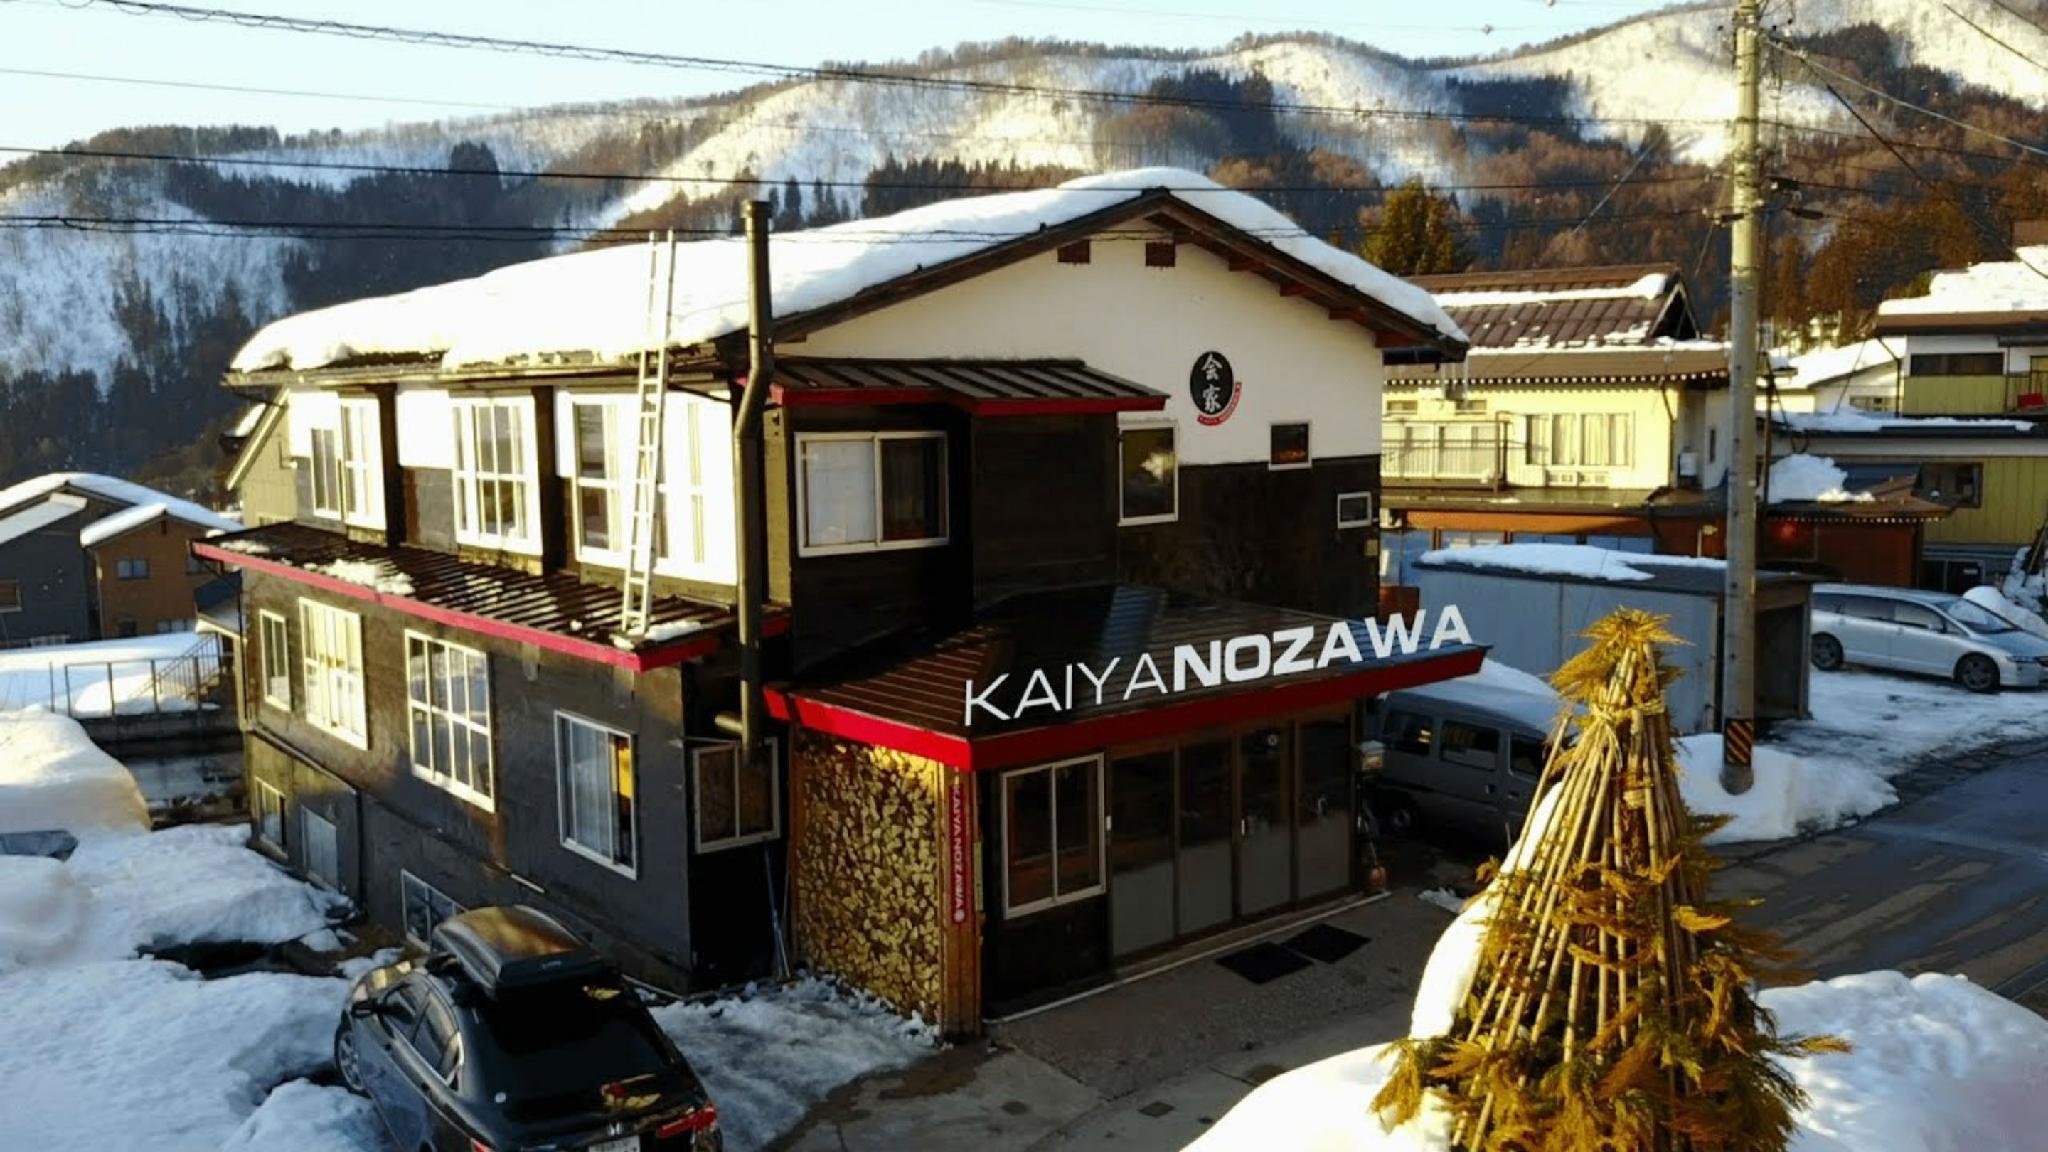 Kaiya Nozawa